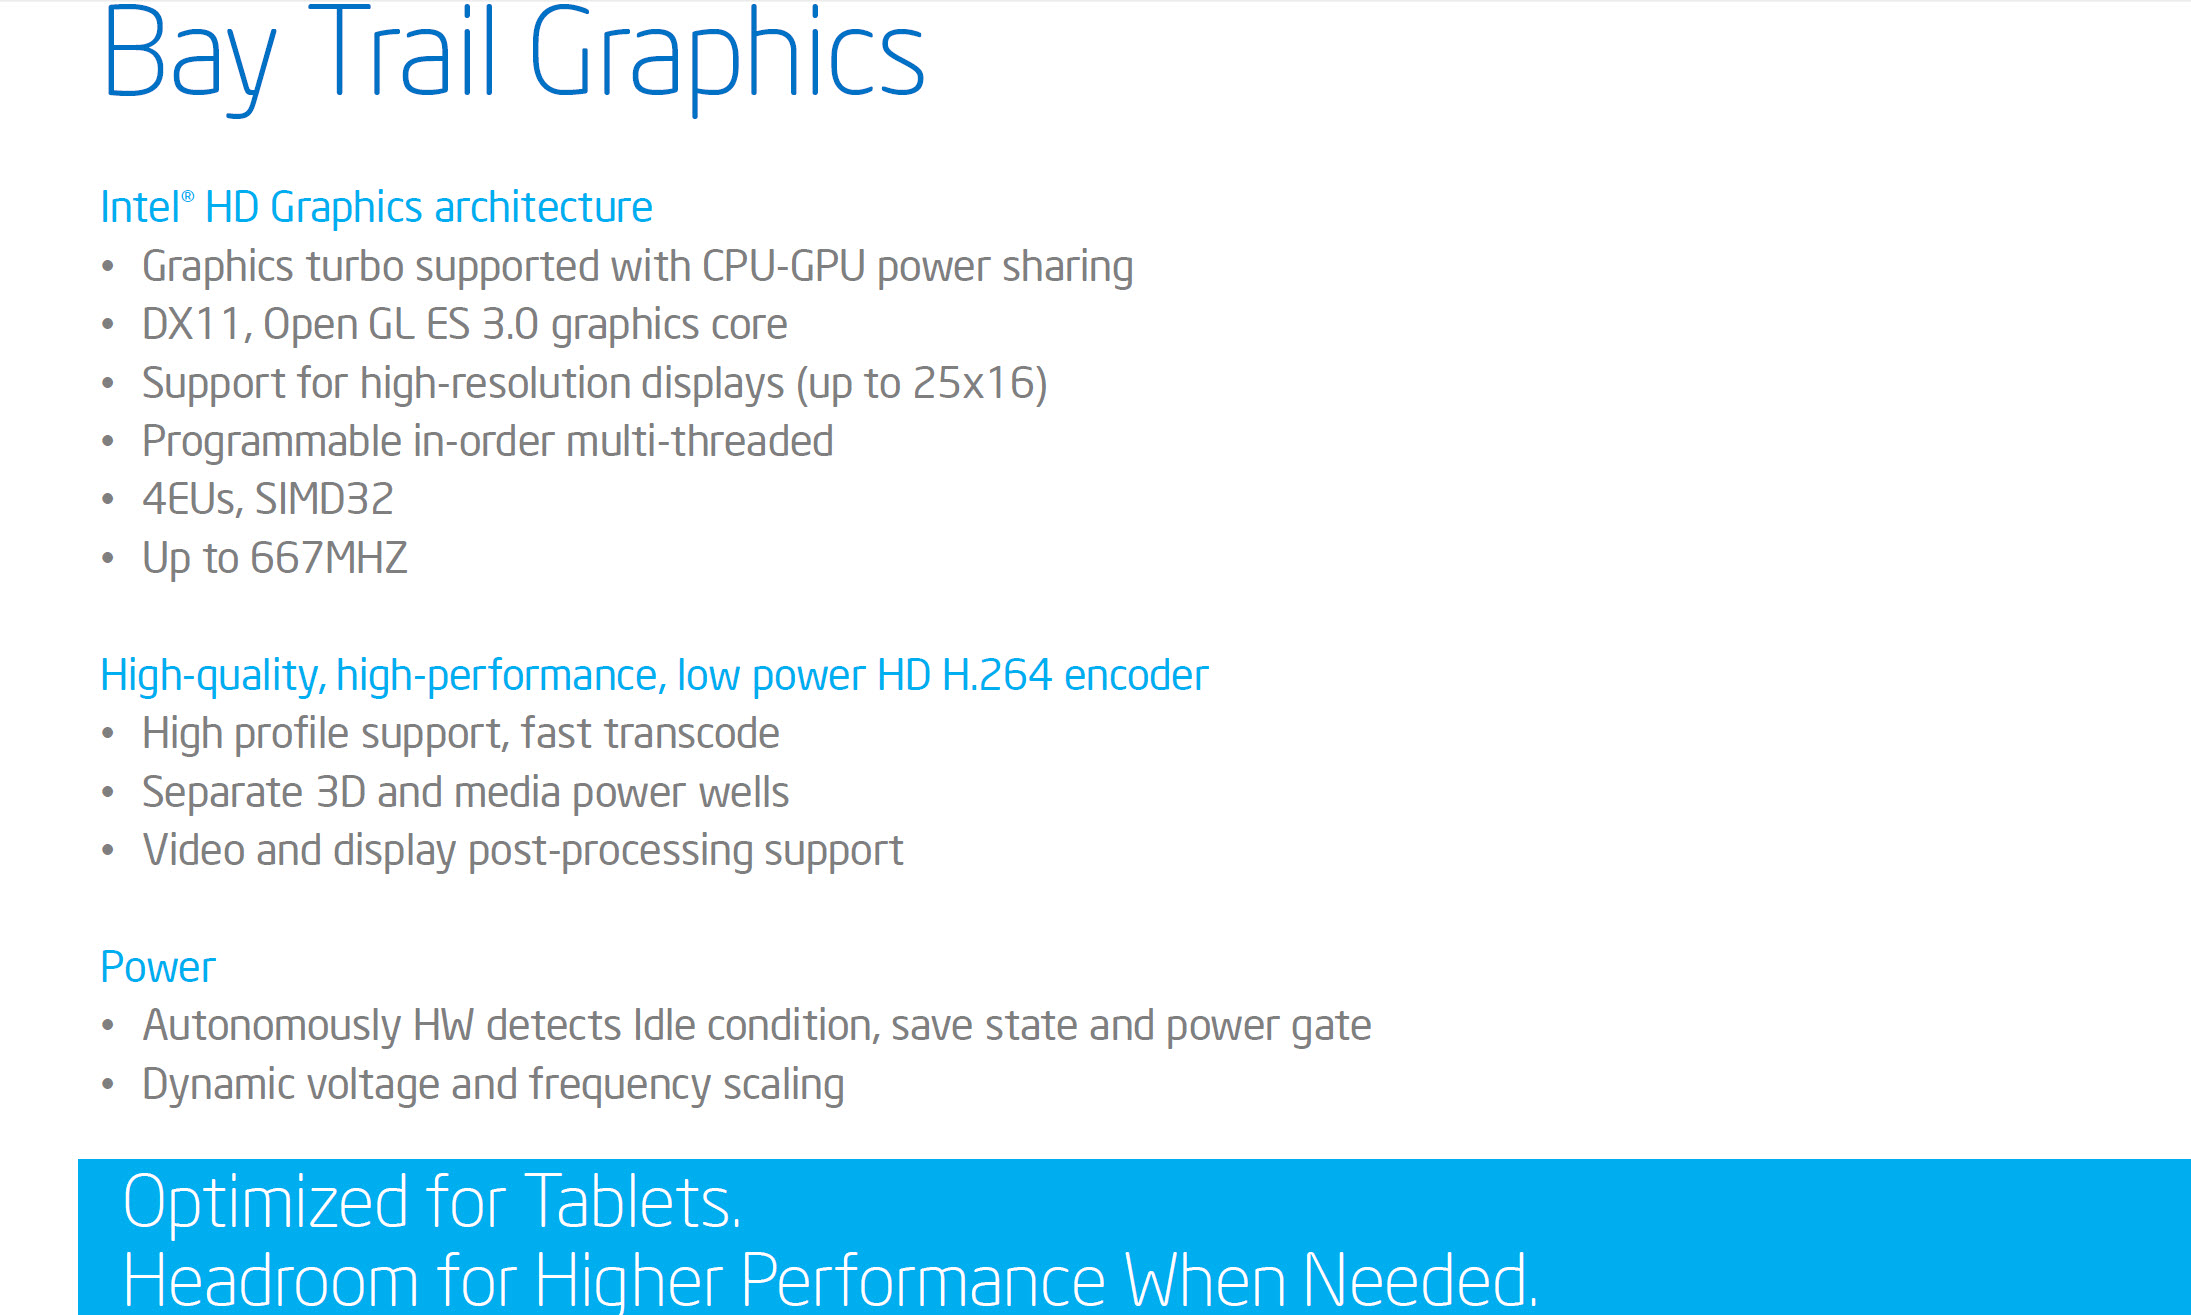 Intel Bay Trail Z3000 Graphics